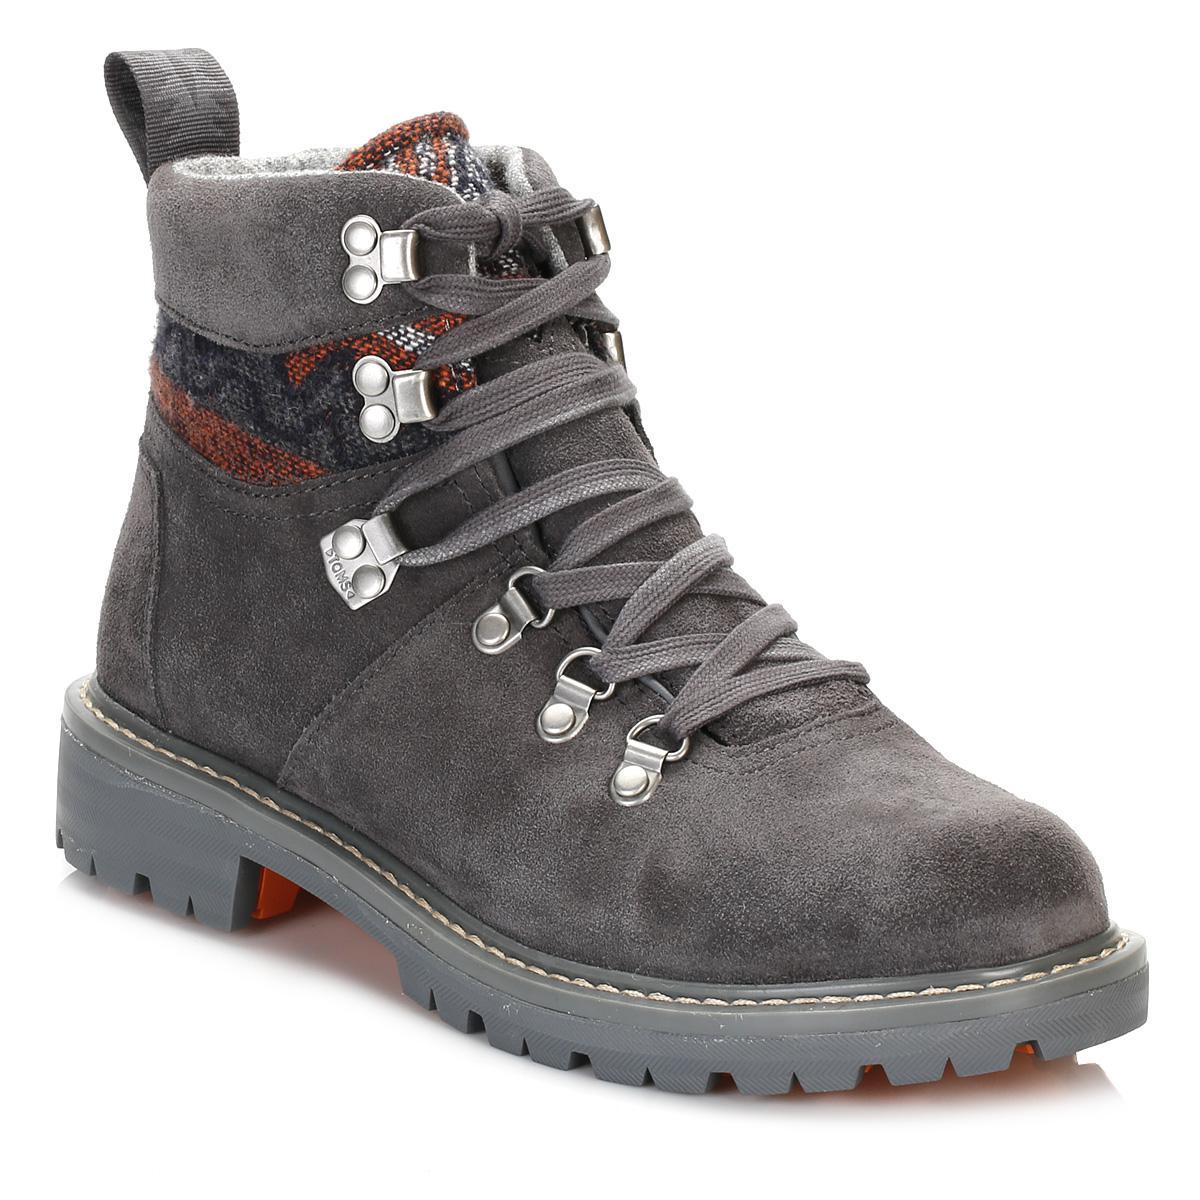 fbd15c3078d TOMS Womens Iron Grey Summit Hiker Boots in Gray - Lyst